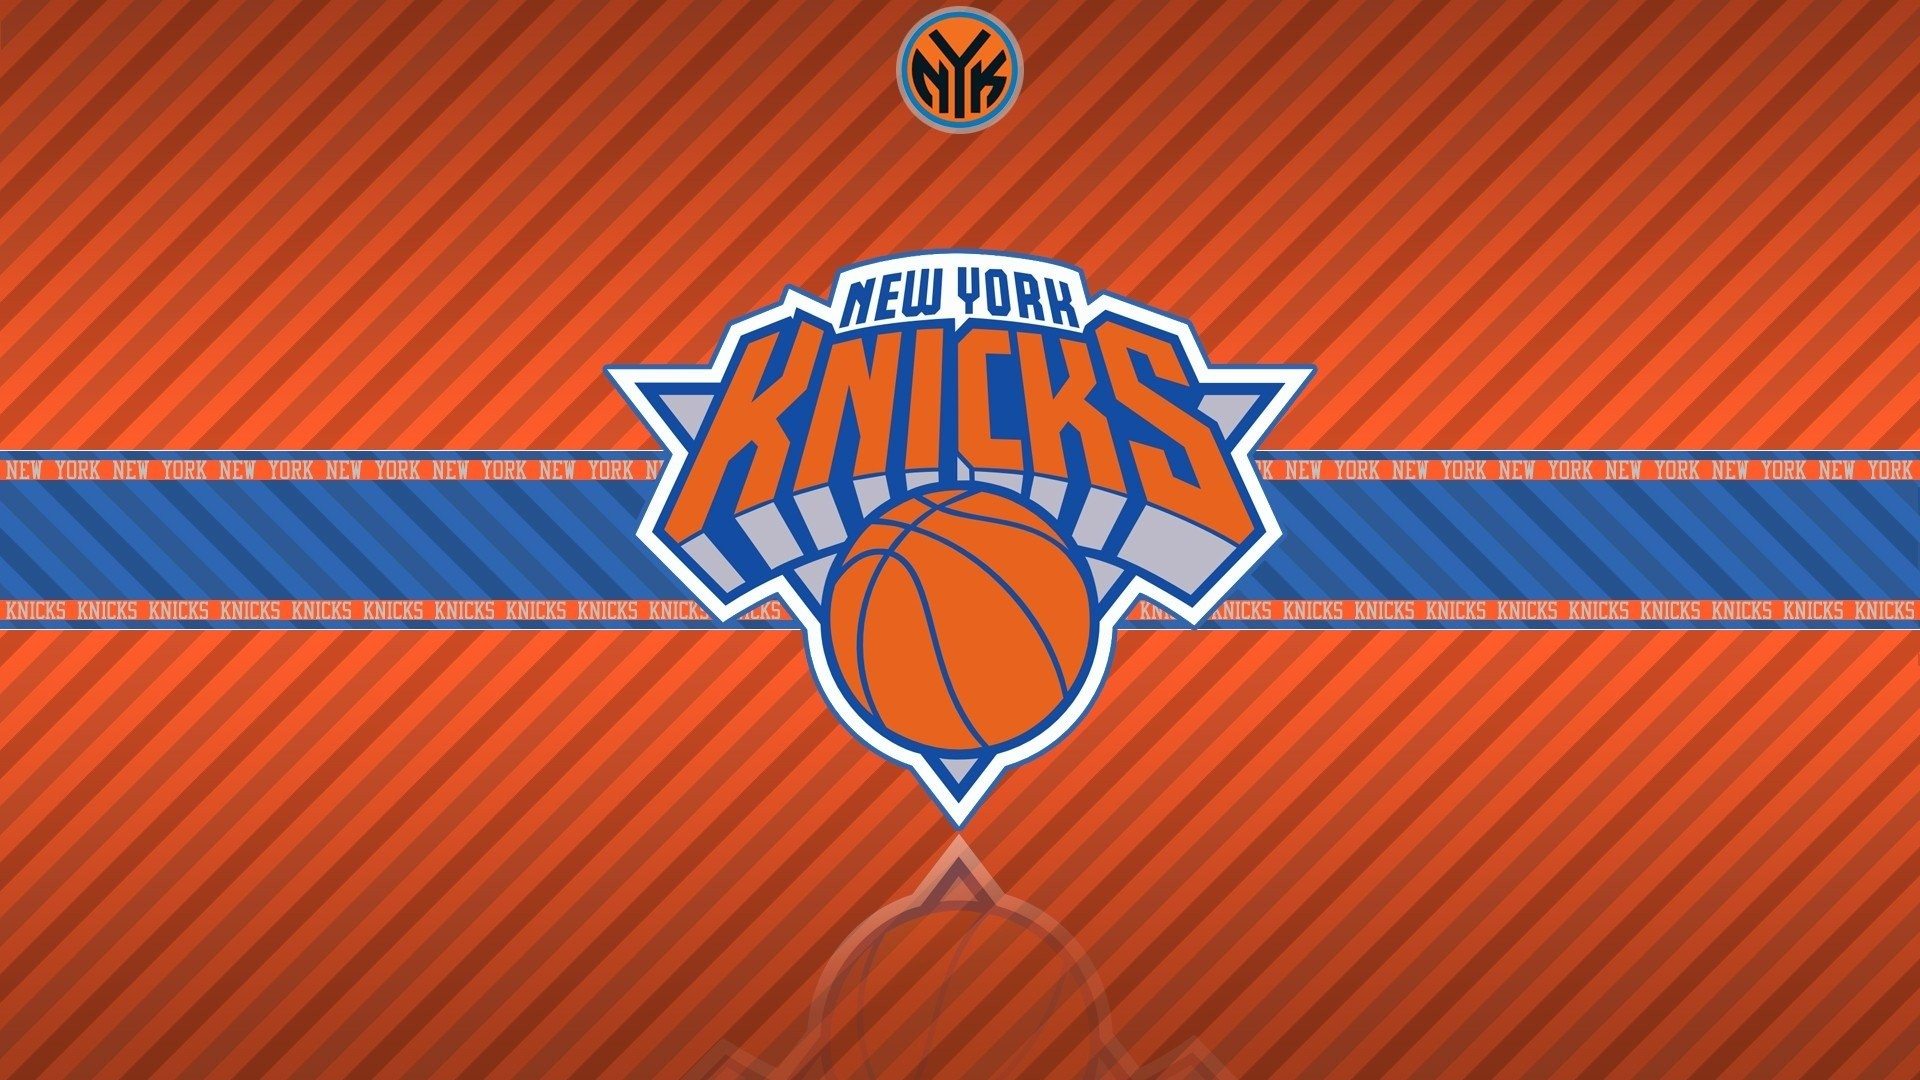 Res: 1920x1080, Sport - New York Knicks Wallpaper